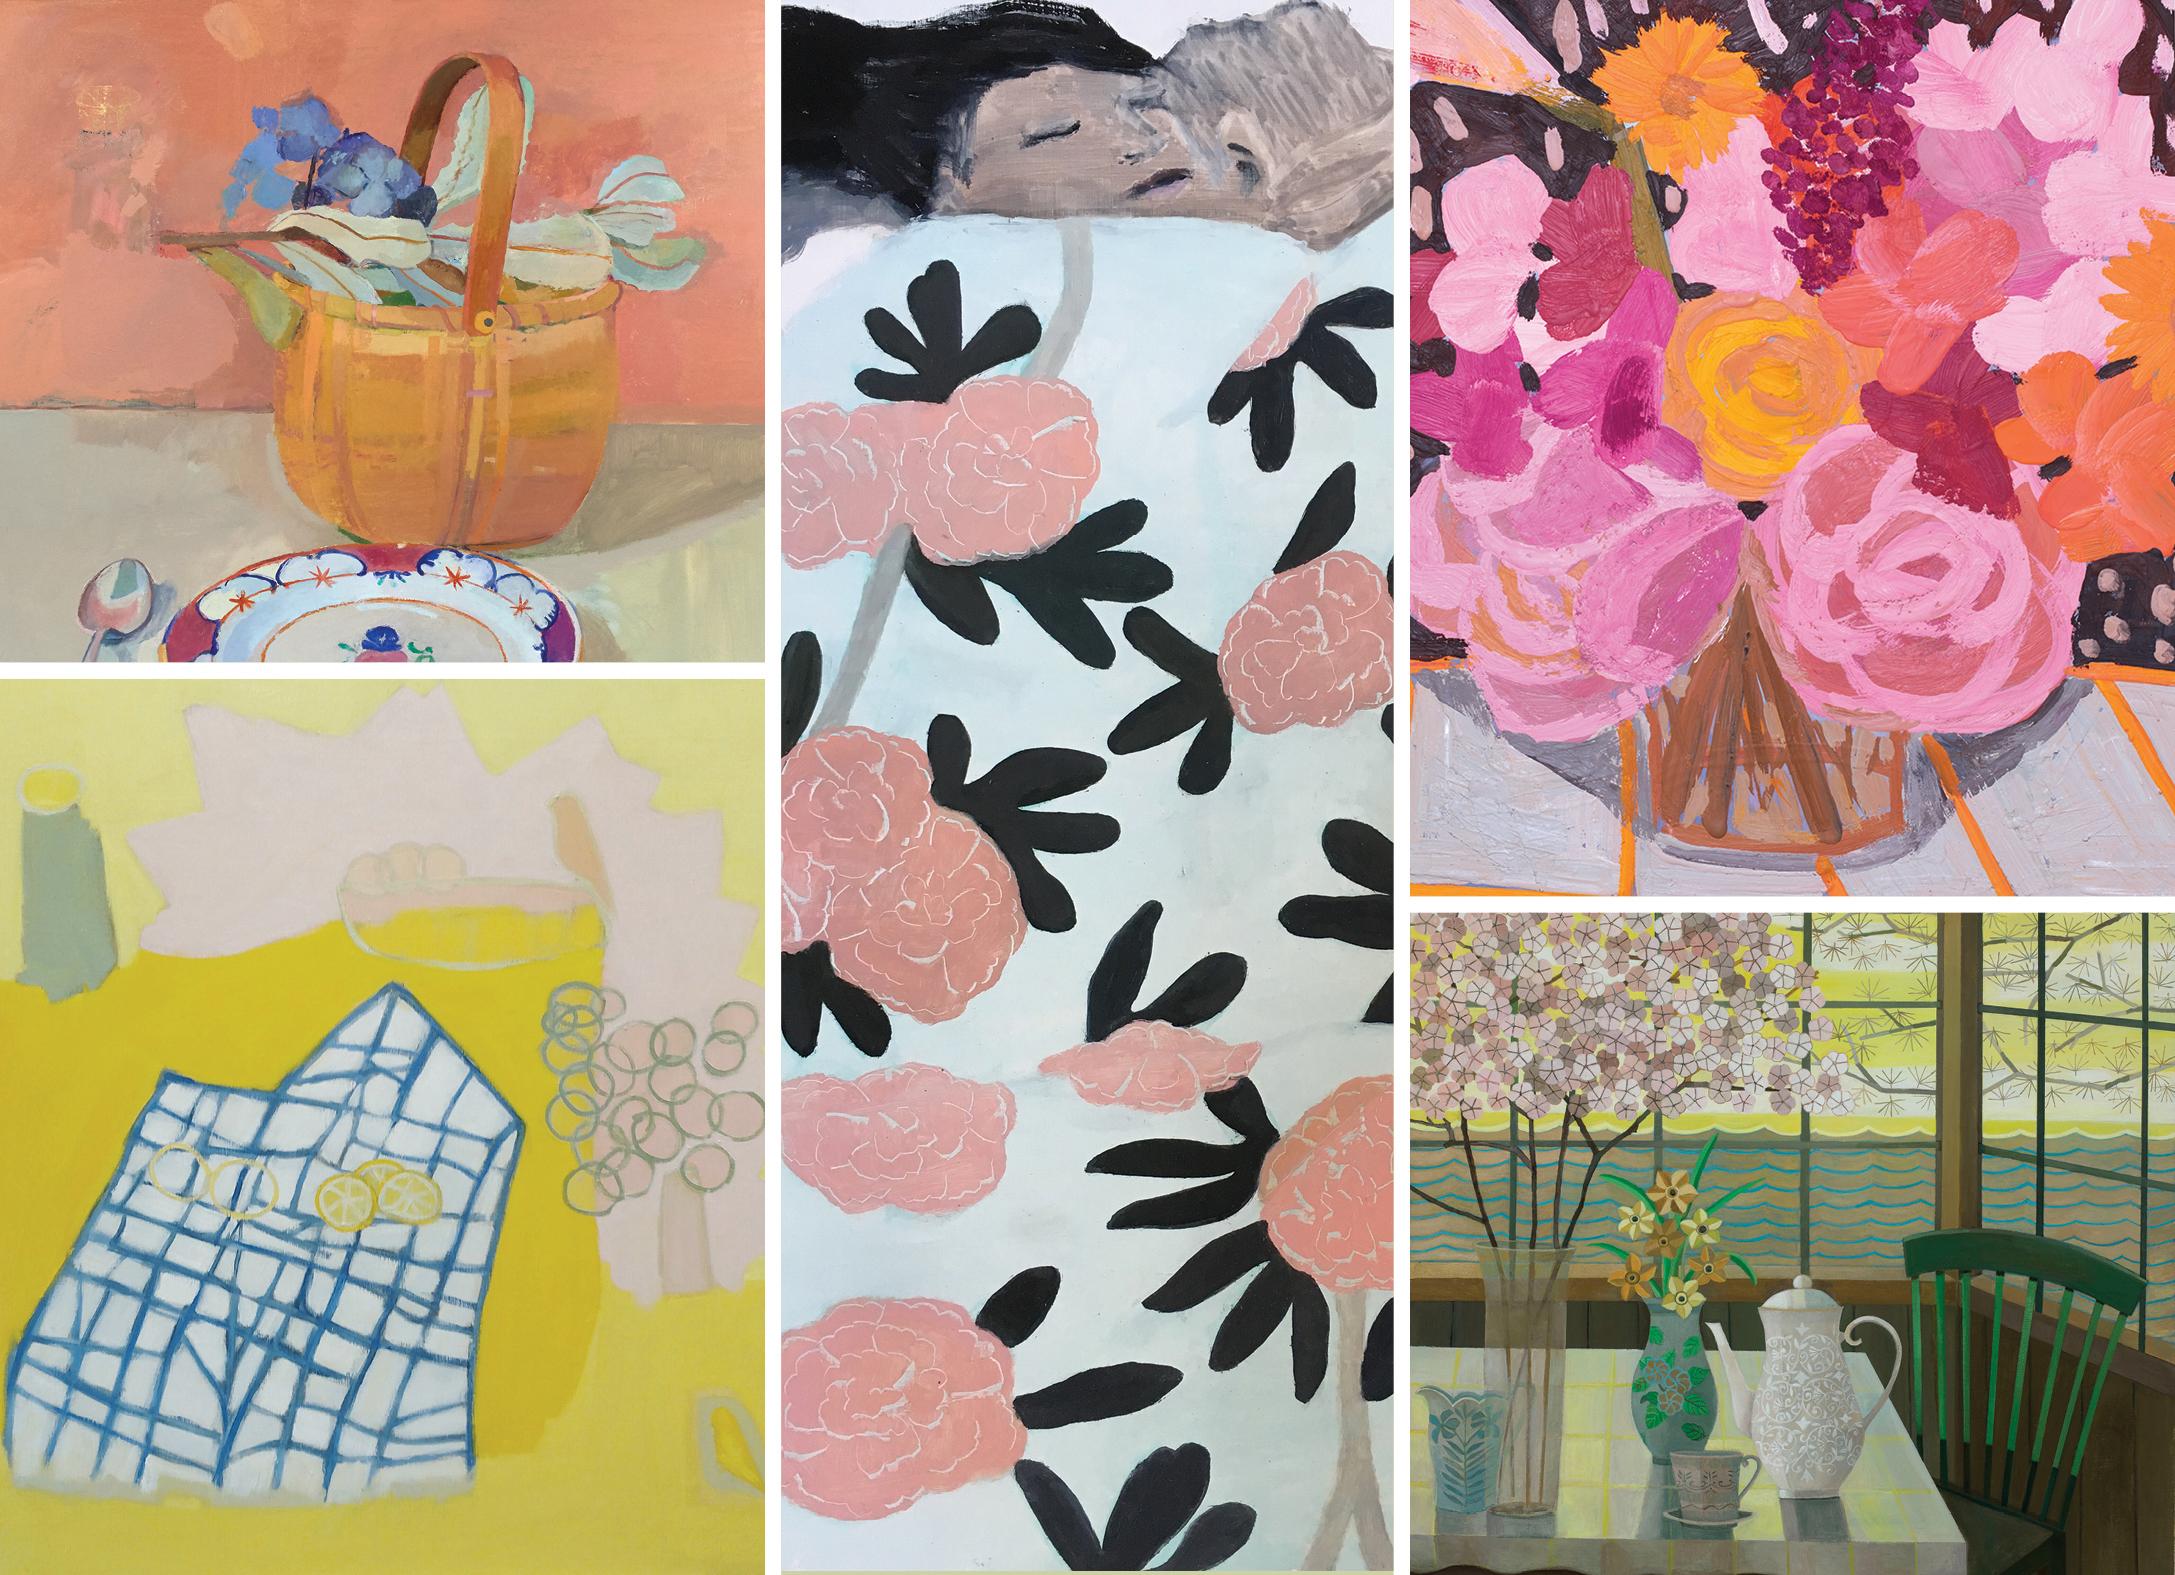 FLOWERING: INSIDE/OUTSIDE - Kathleen Craig | Xico Greenwald | Aubrey Levinthal | Gail Spaien | Anna ValdezJune 13 - July 26, 2019